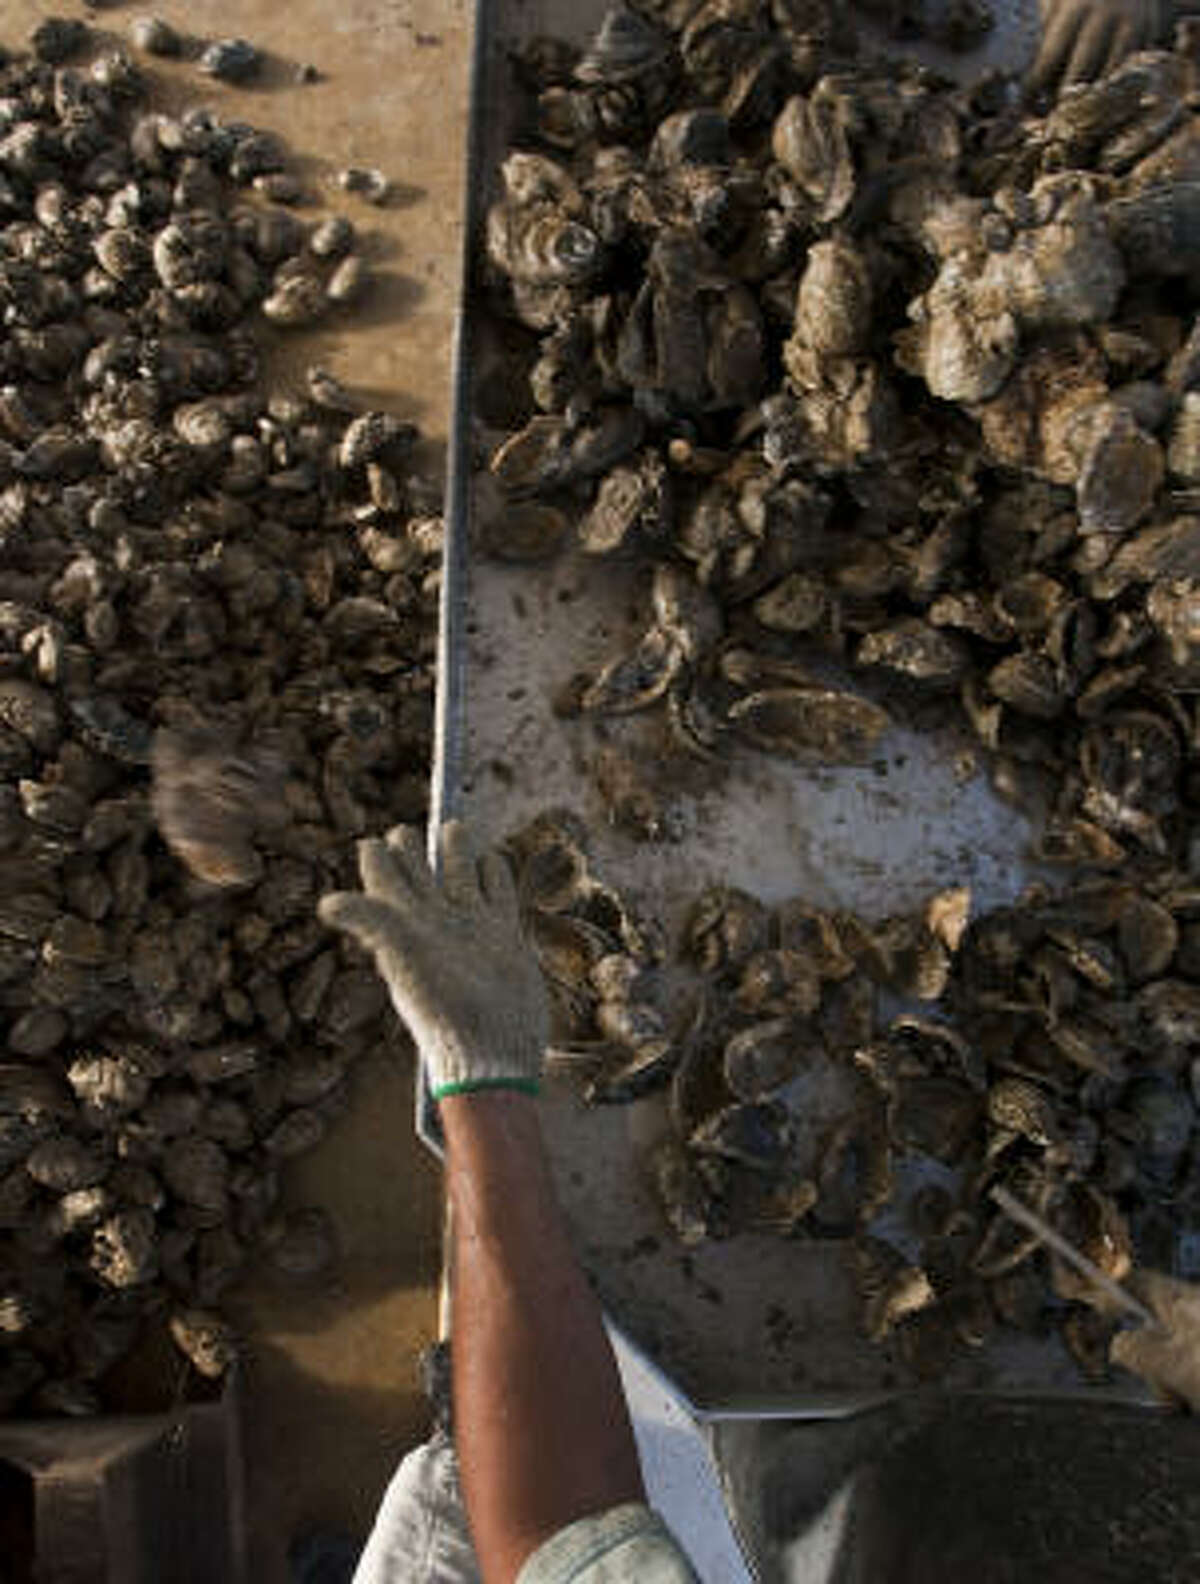 Alejandro Muniz culls oysters aboard Jeri's Seafood oyster boat in Galveston's East Bay.